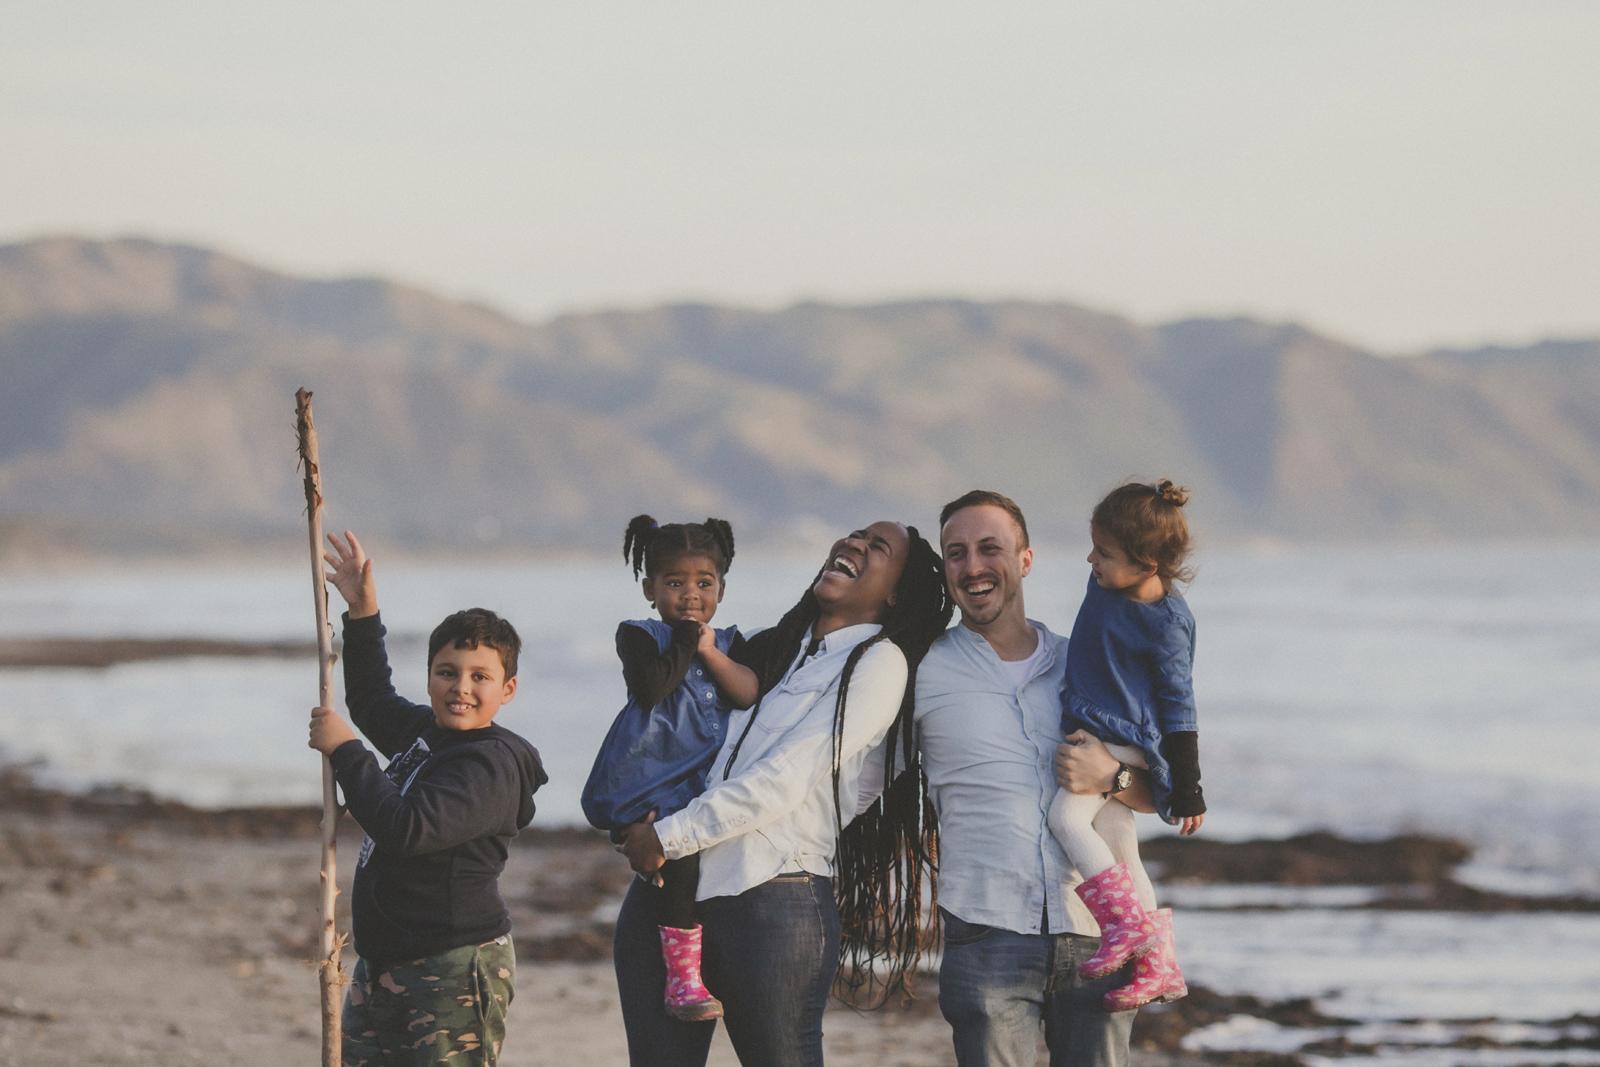 Famiy photos on a winter beach in Kapiti near Wellington, by Jenny Siaosi. Siaosi Photography.